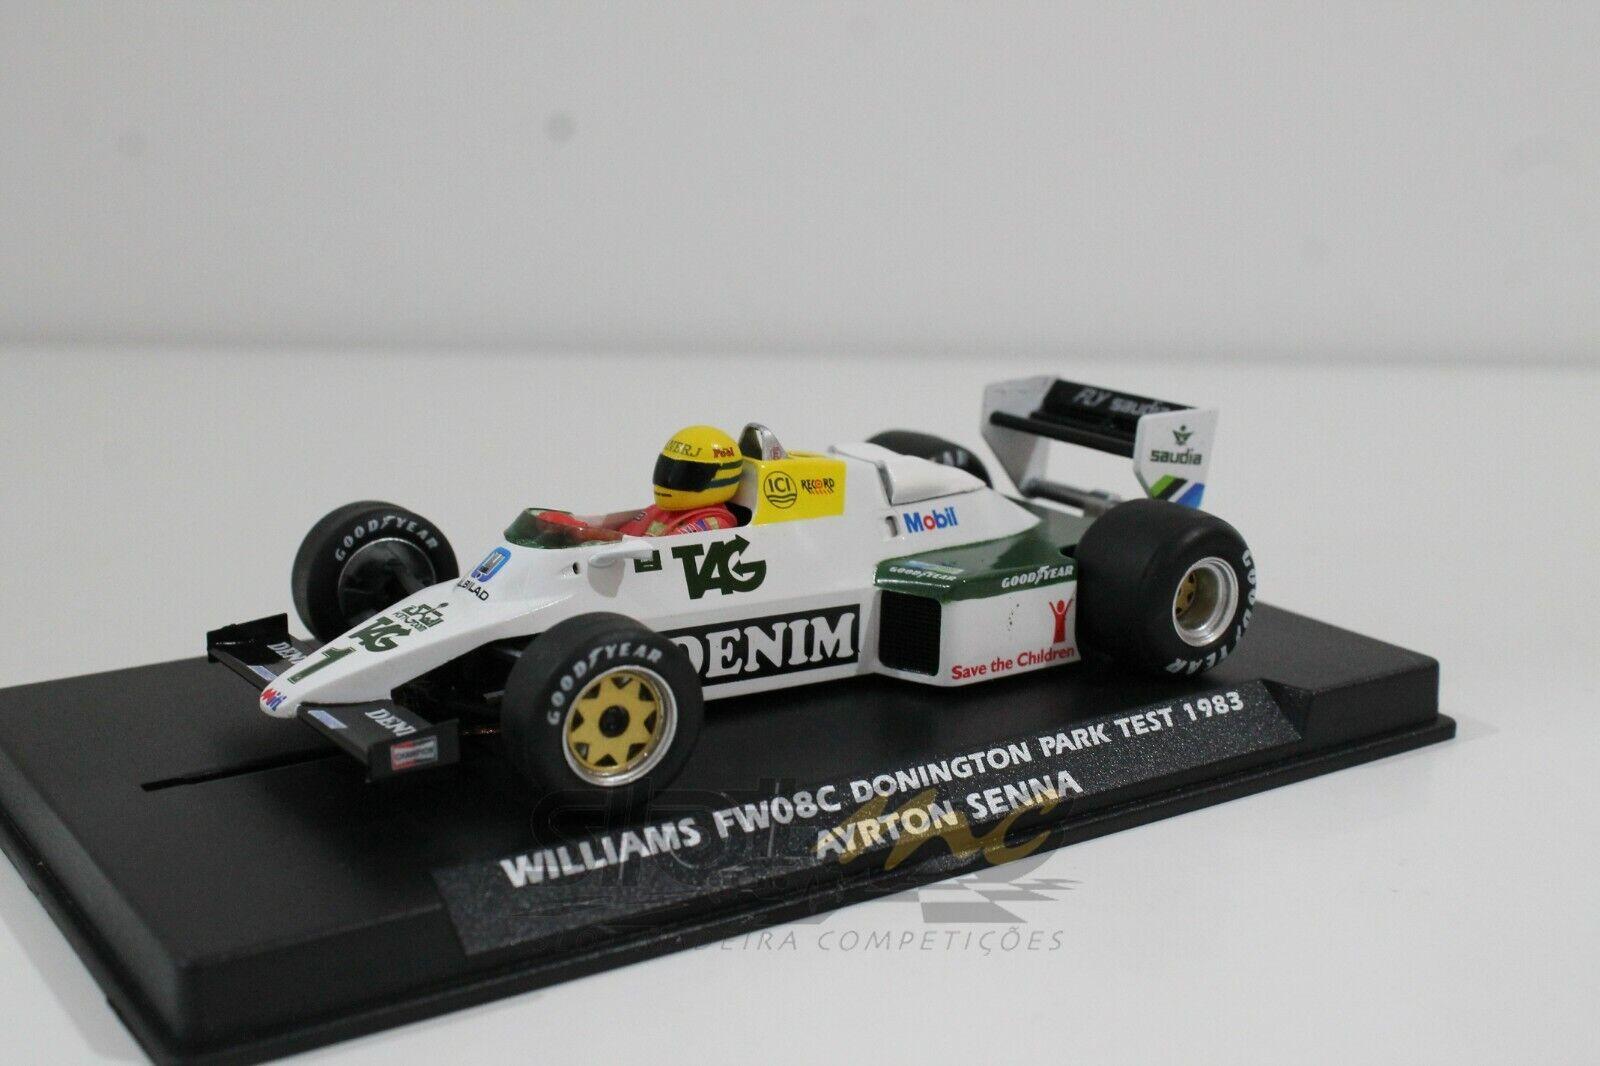 Flyslot W40101 Williams Williams Williams FW08C Gomington Park Test 1983 Ayrton Senna 1 32   NEW  3a909e